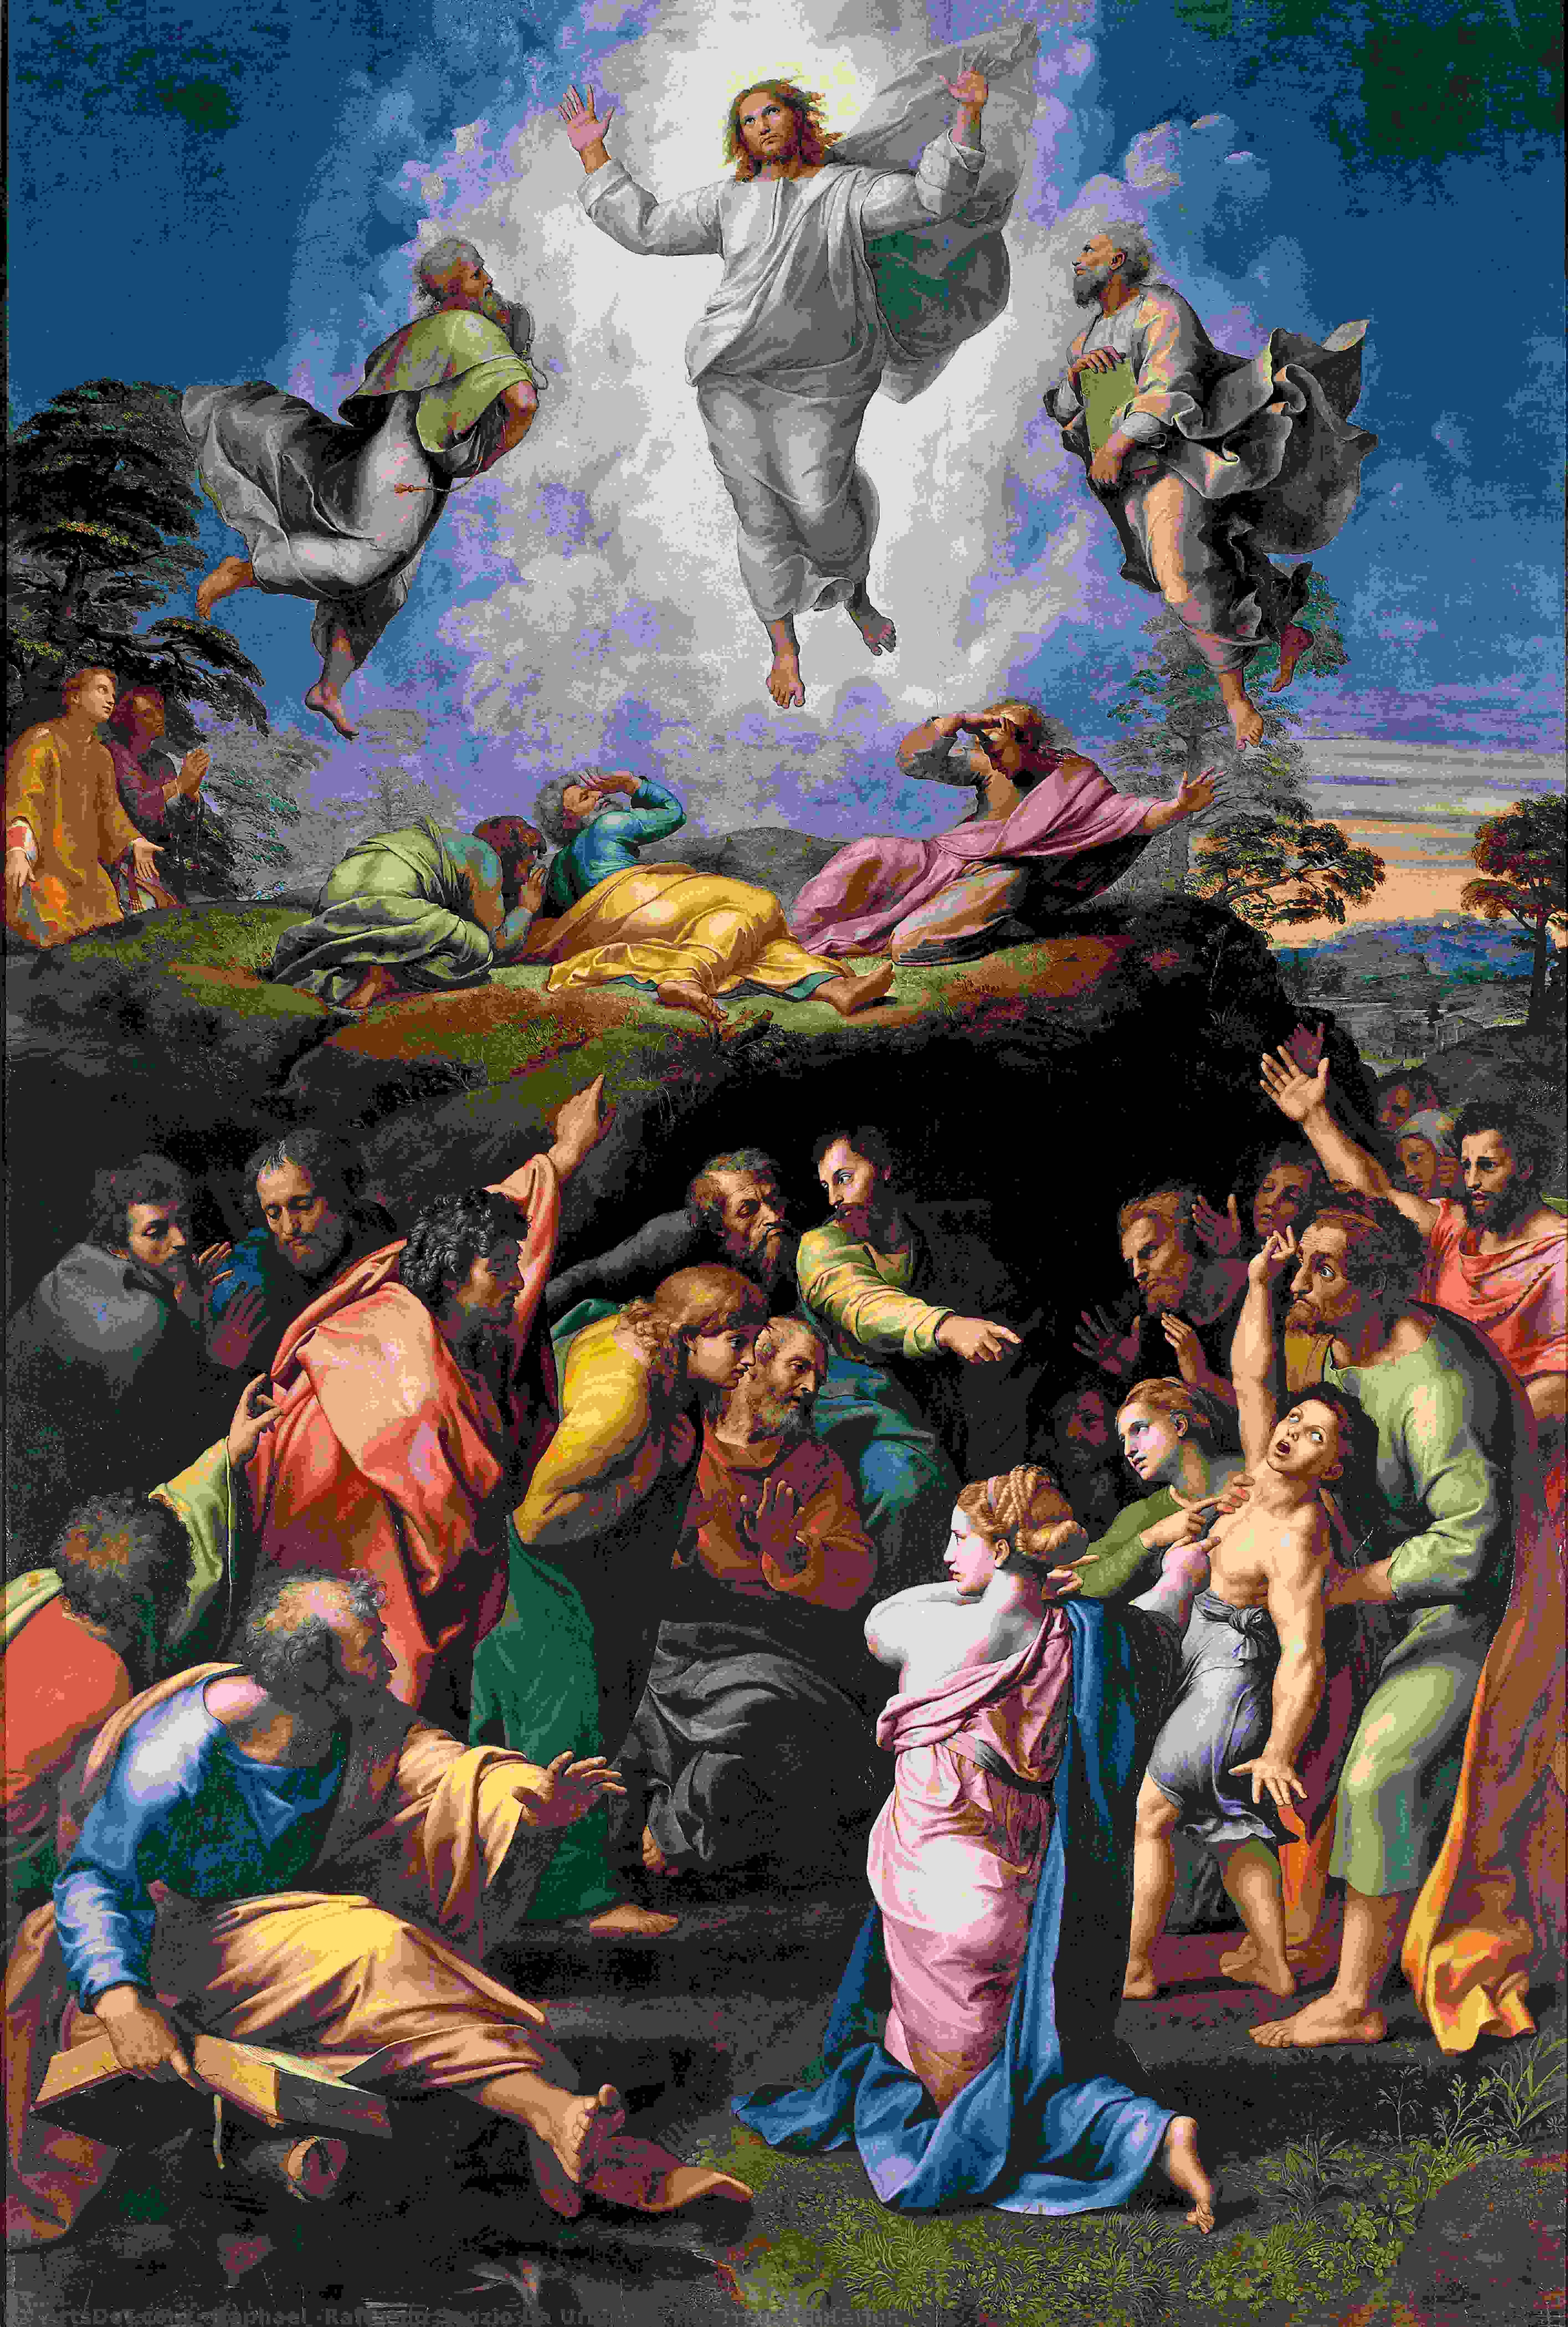 Wikioo.org - The Encyclopedia of Fine Arts - Painting, Artwork by Raphael (Raffaello Sanzio Da Urbino) - The Transfiguration